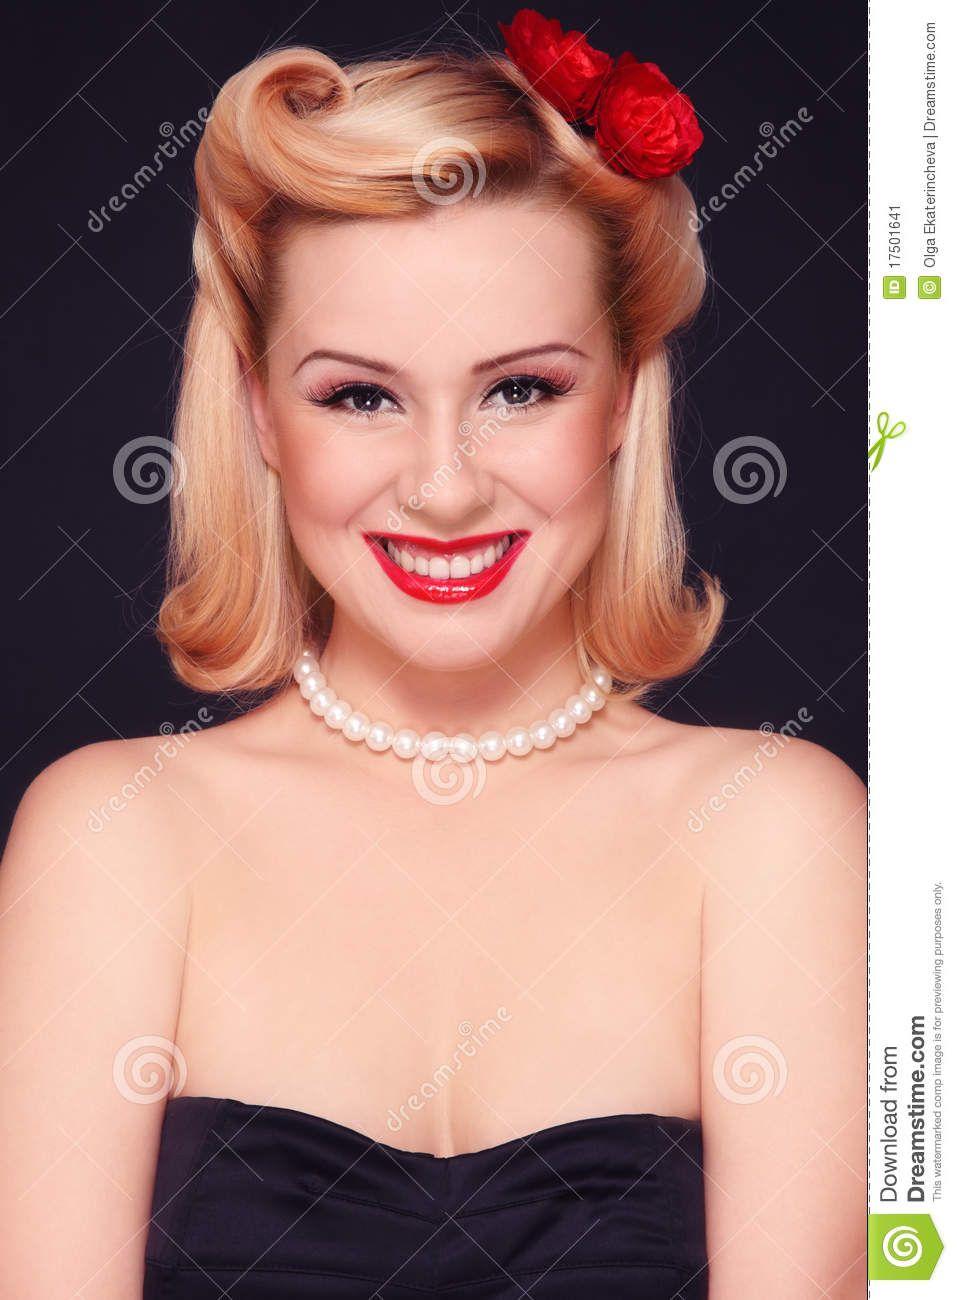 1940 Hairstyles For Women With Long Hair Schöne Junge Reizvolle